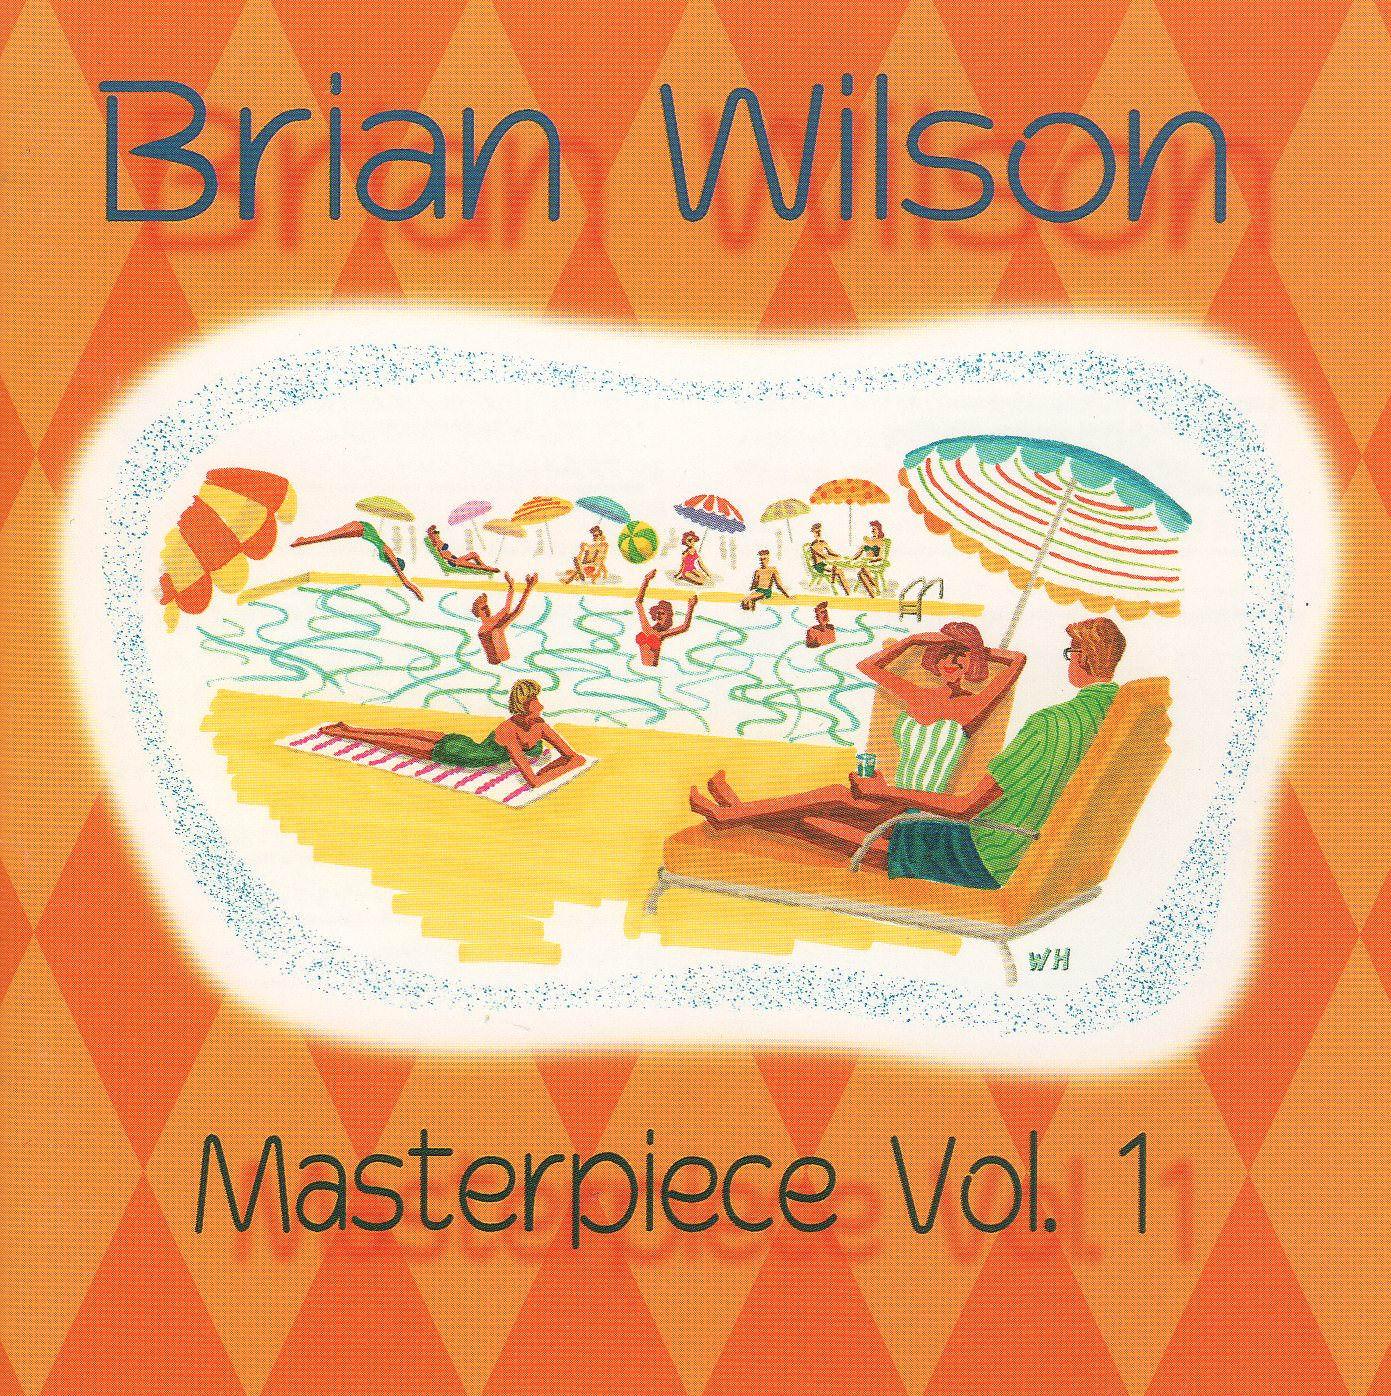 Masterpiece Vol. 1 cover